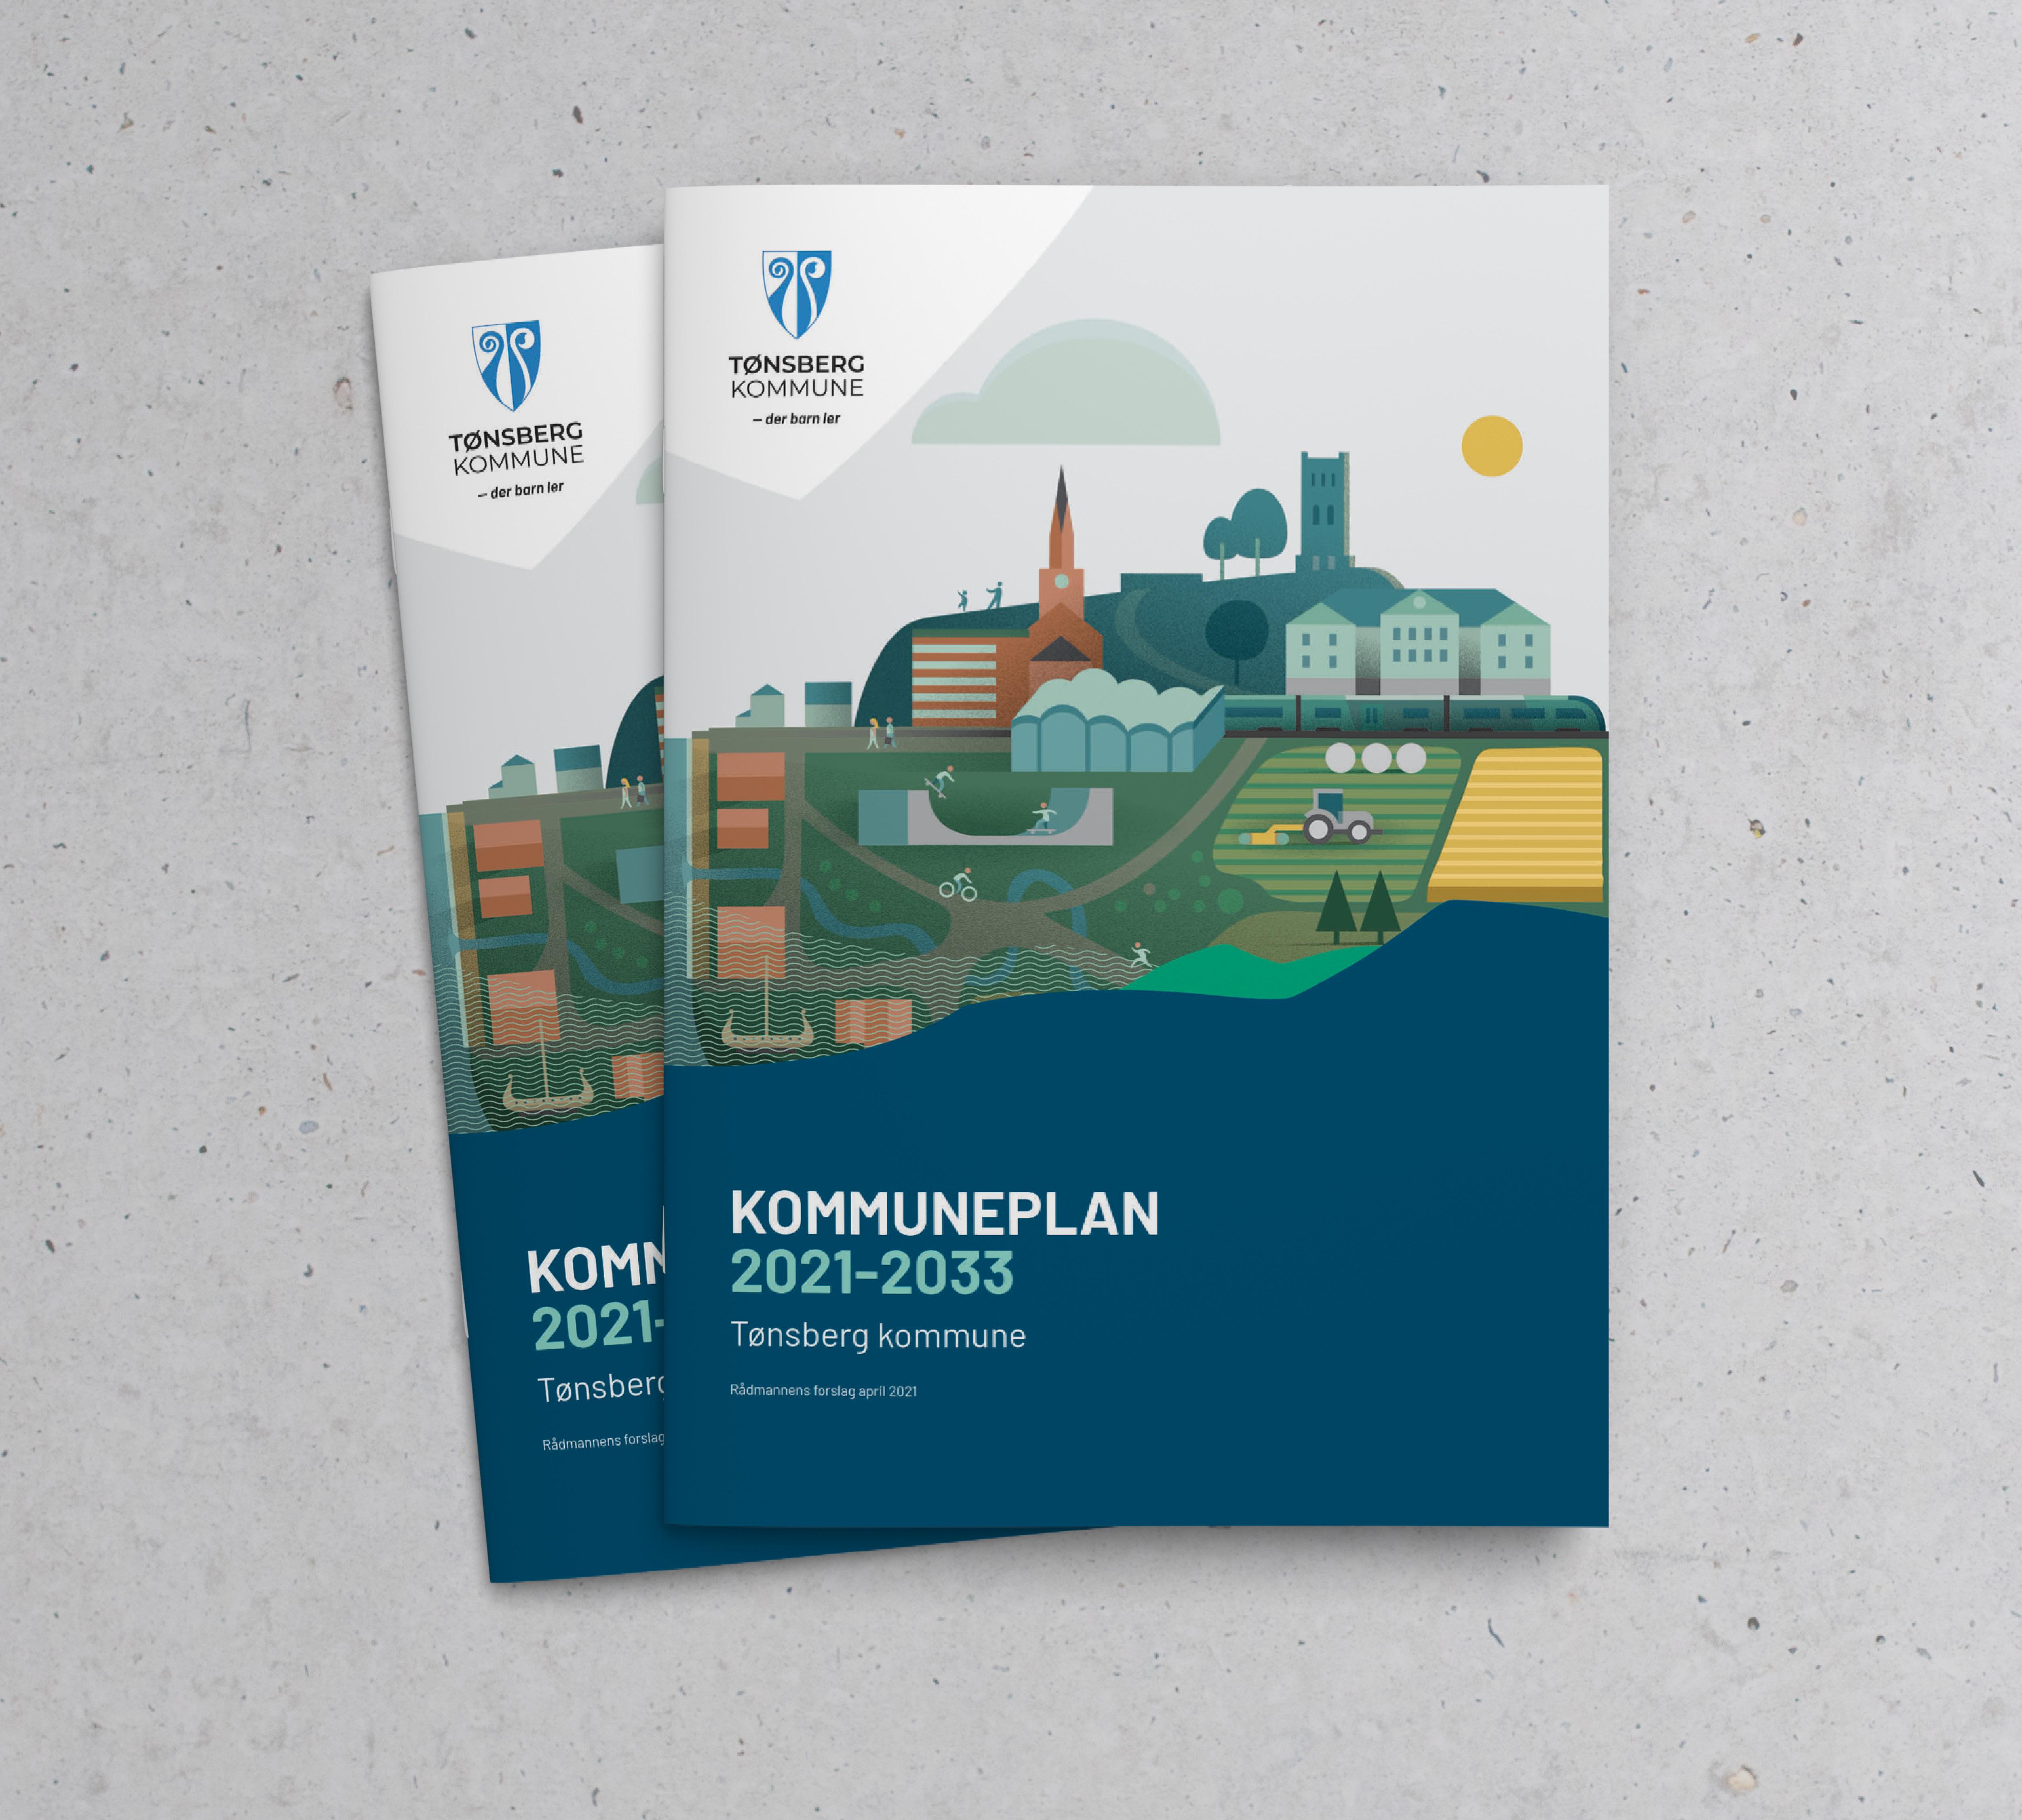 Tønsberg kommuneplan